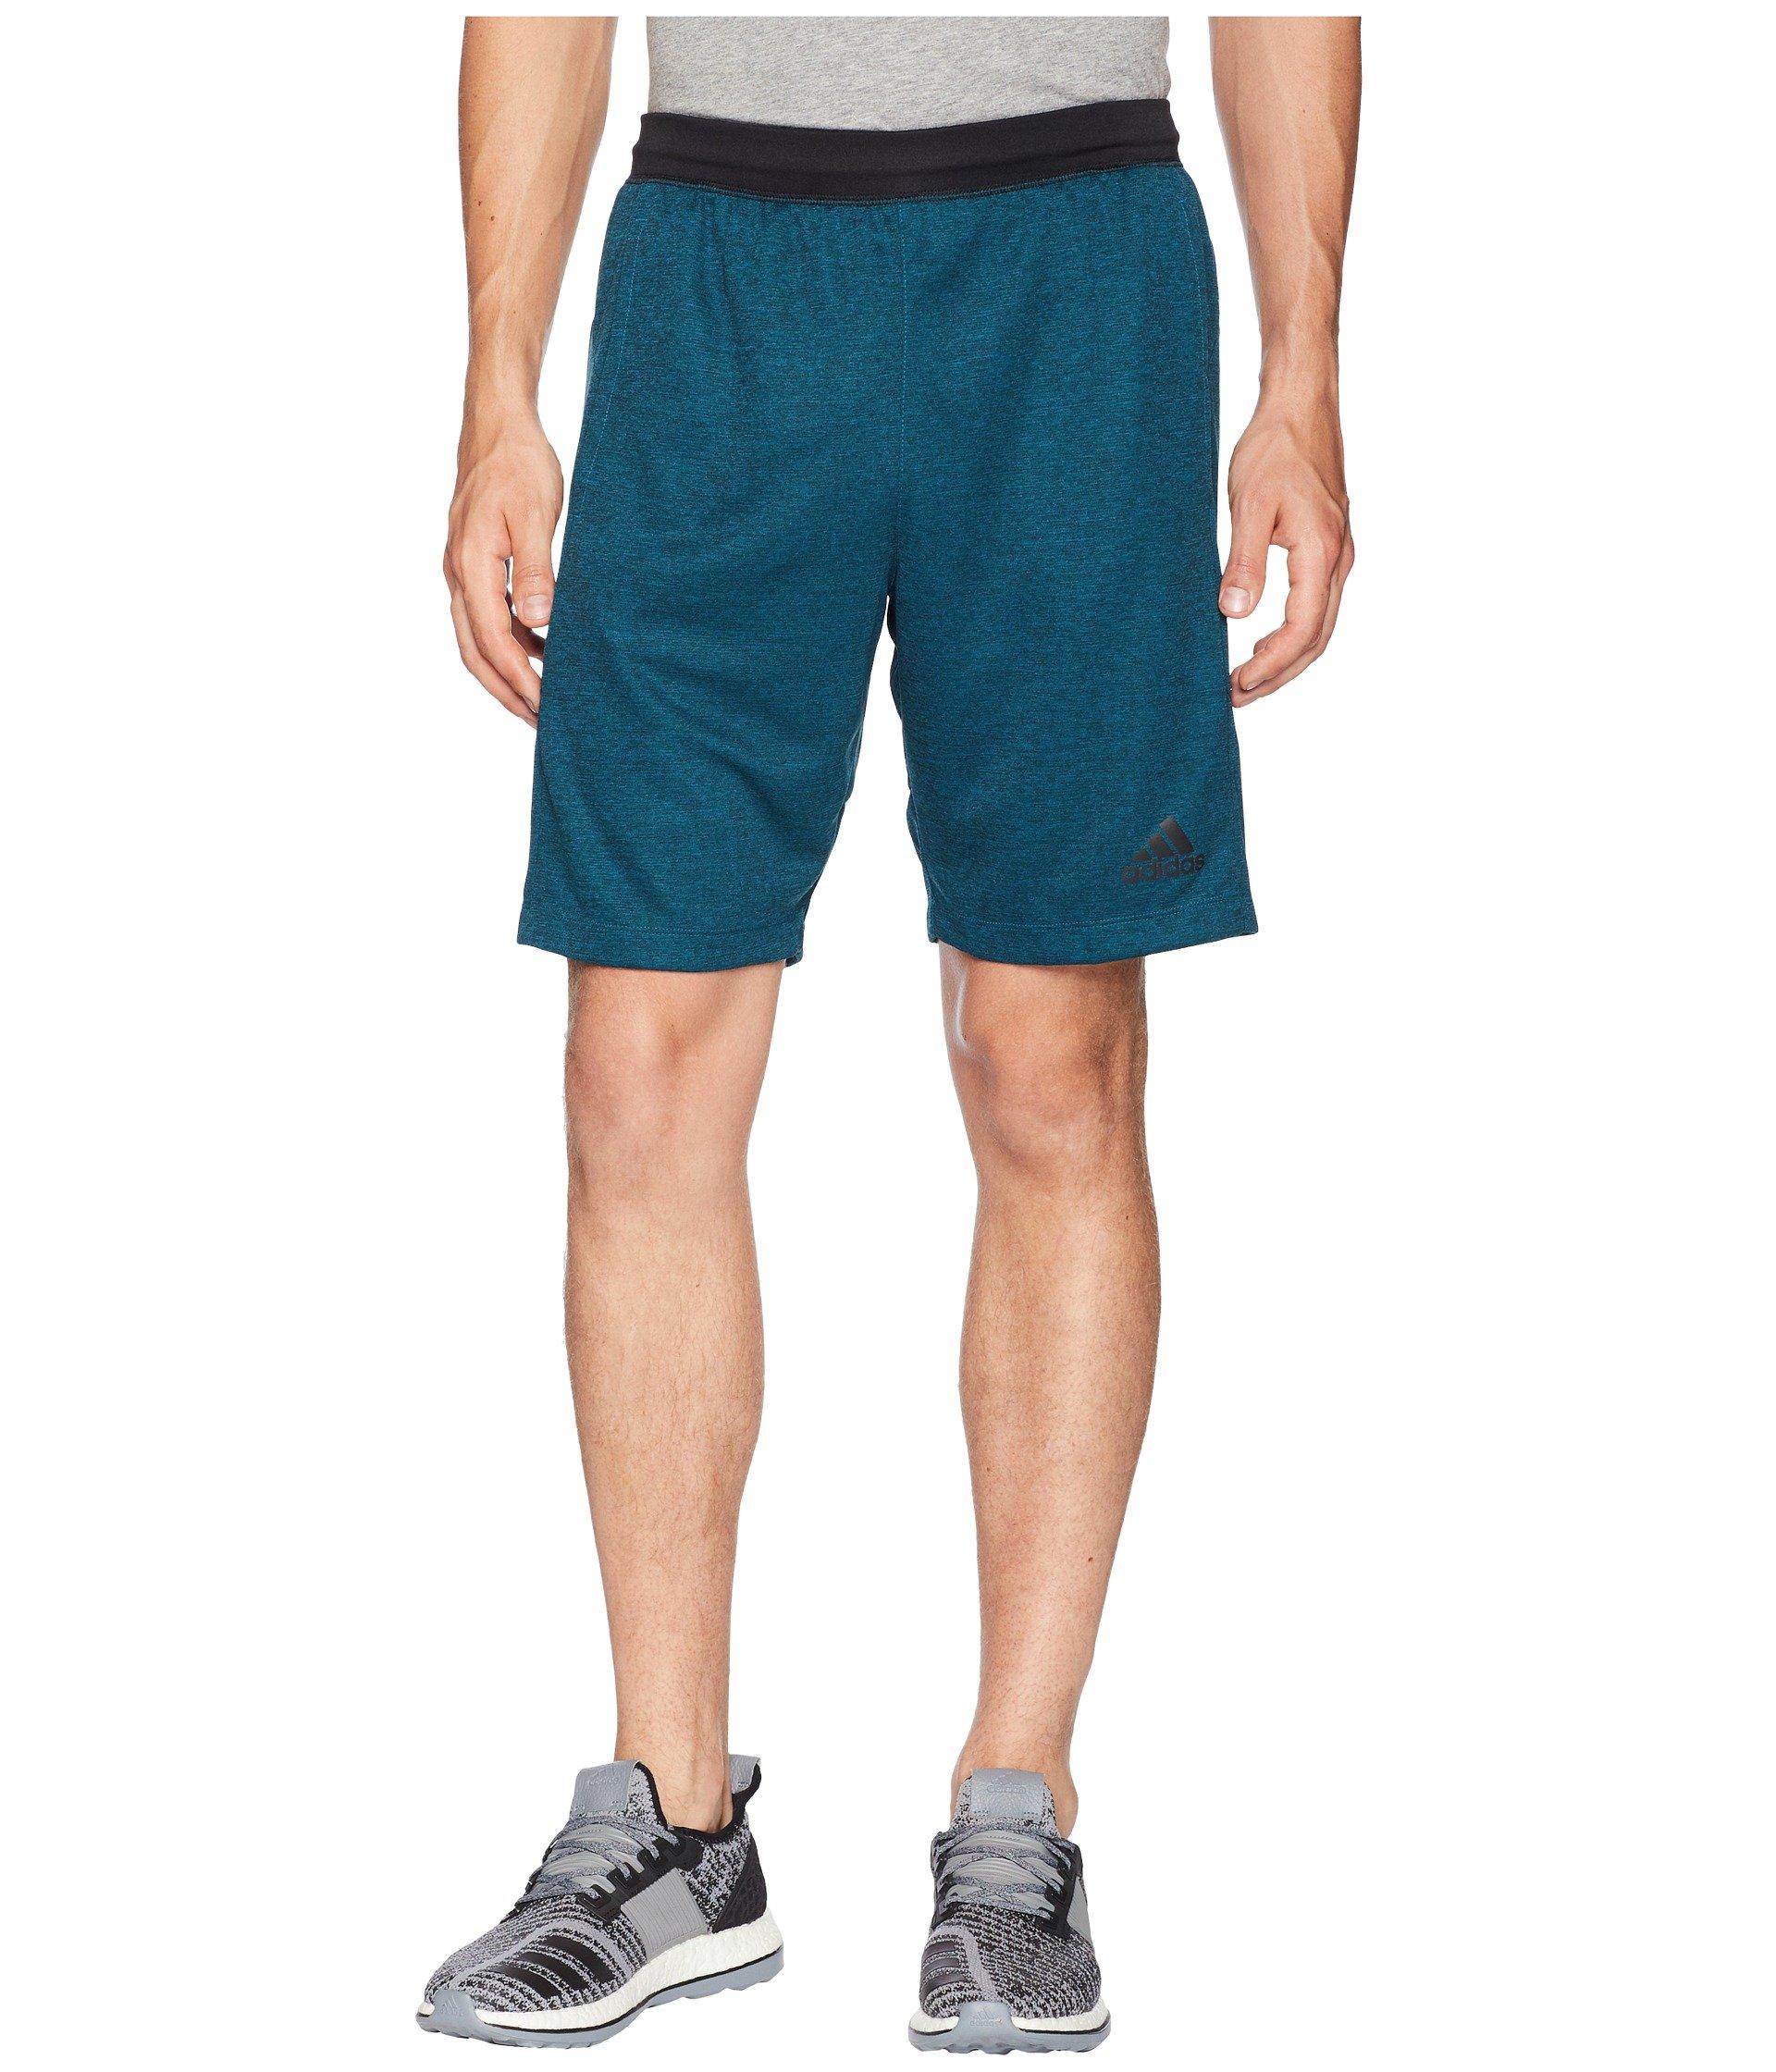 adidas Men's SpeedBreaker Hype Shorts Real